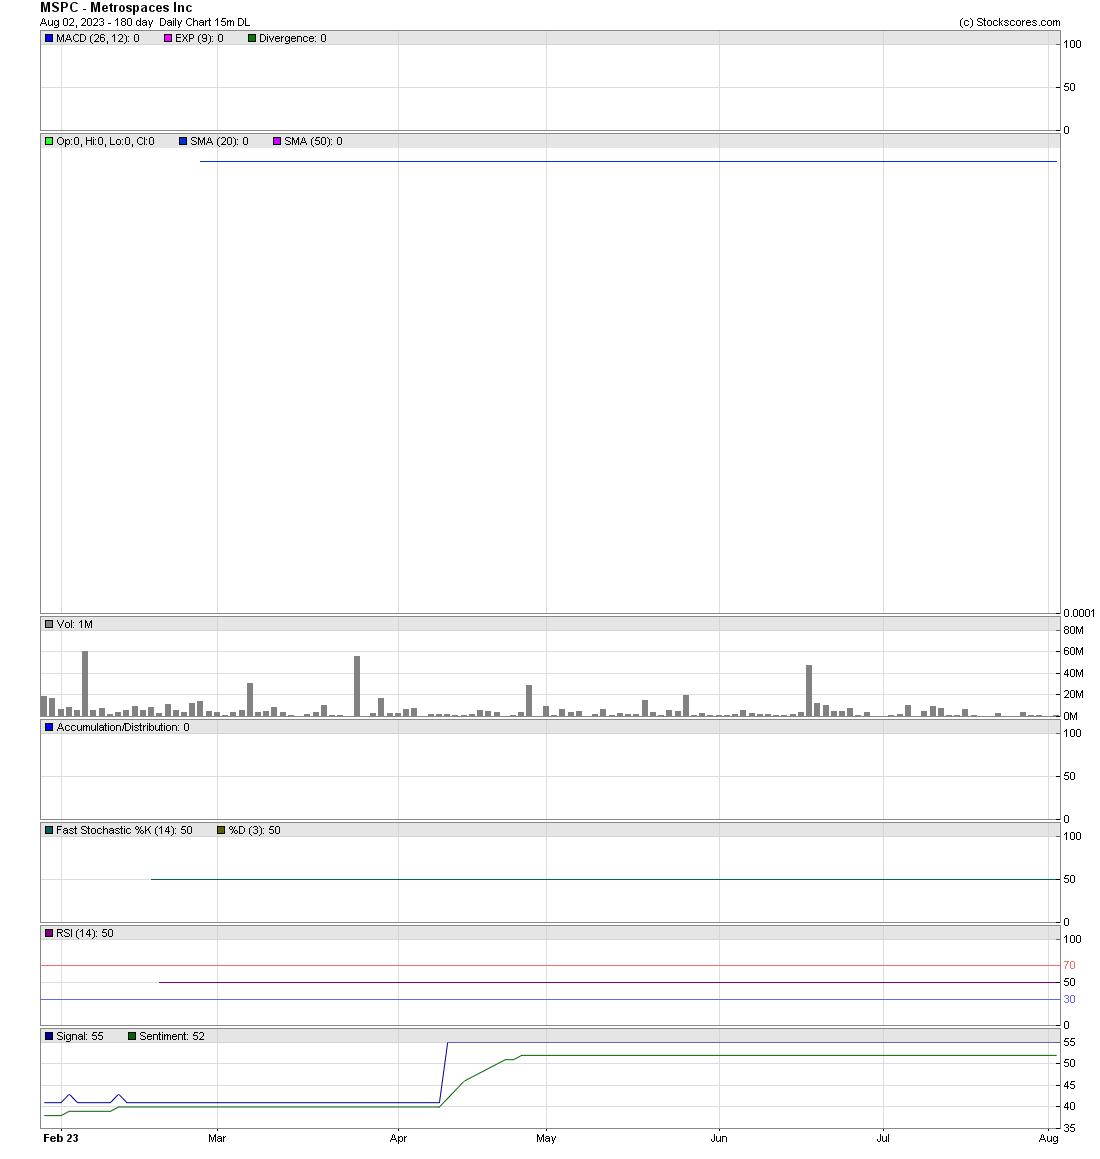 Metrospaces Inc Mspc Stock Message Board Investorshub